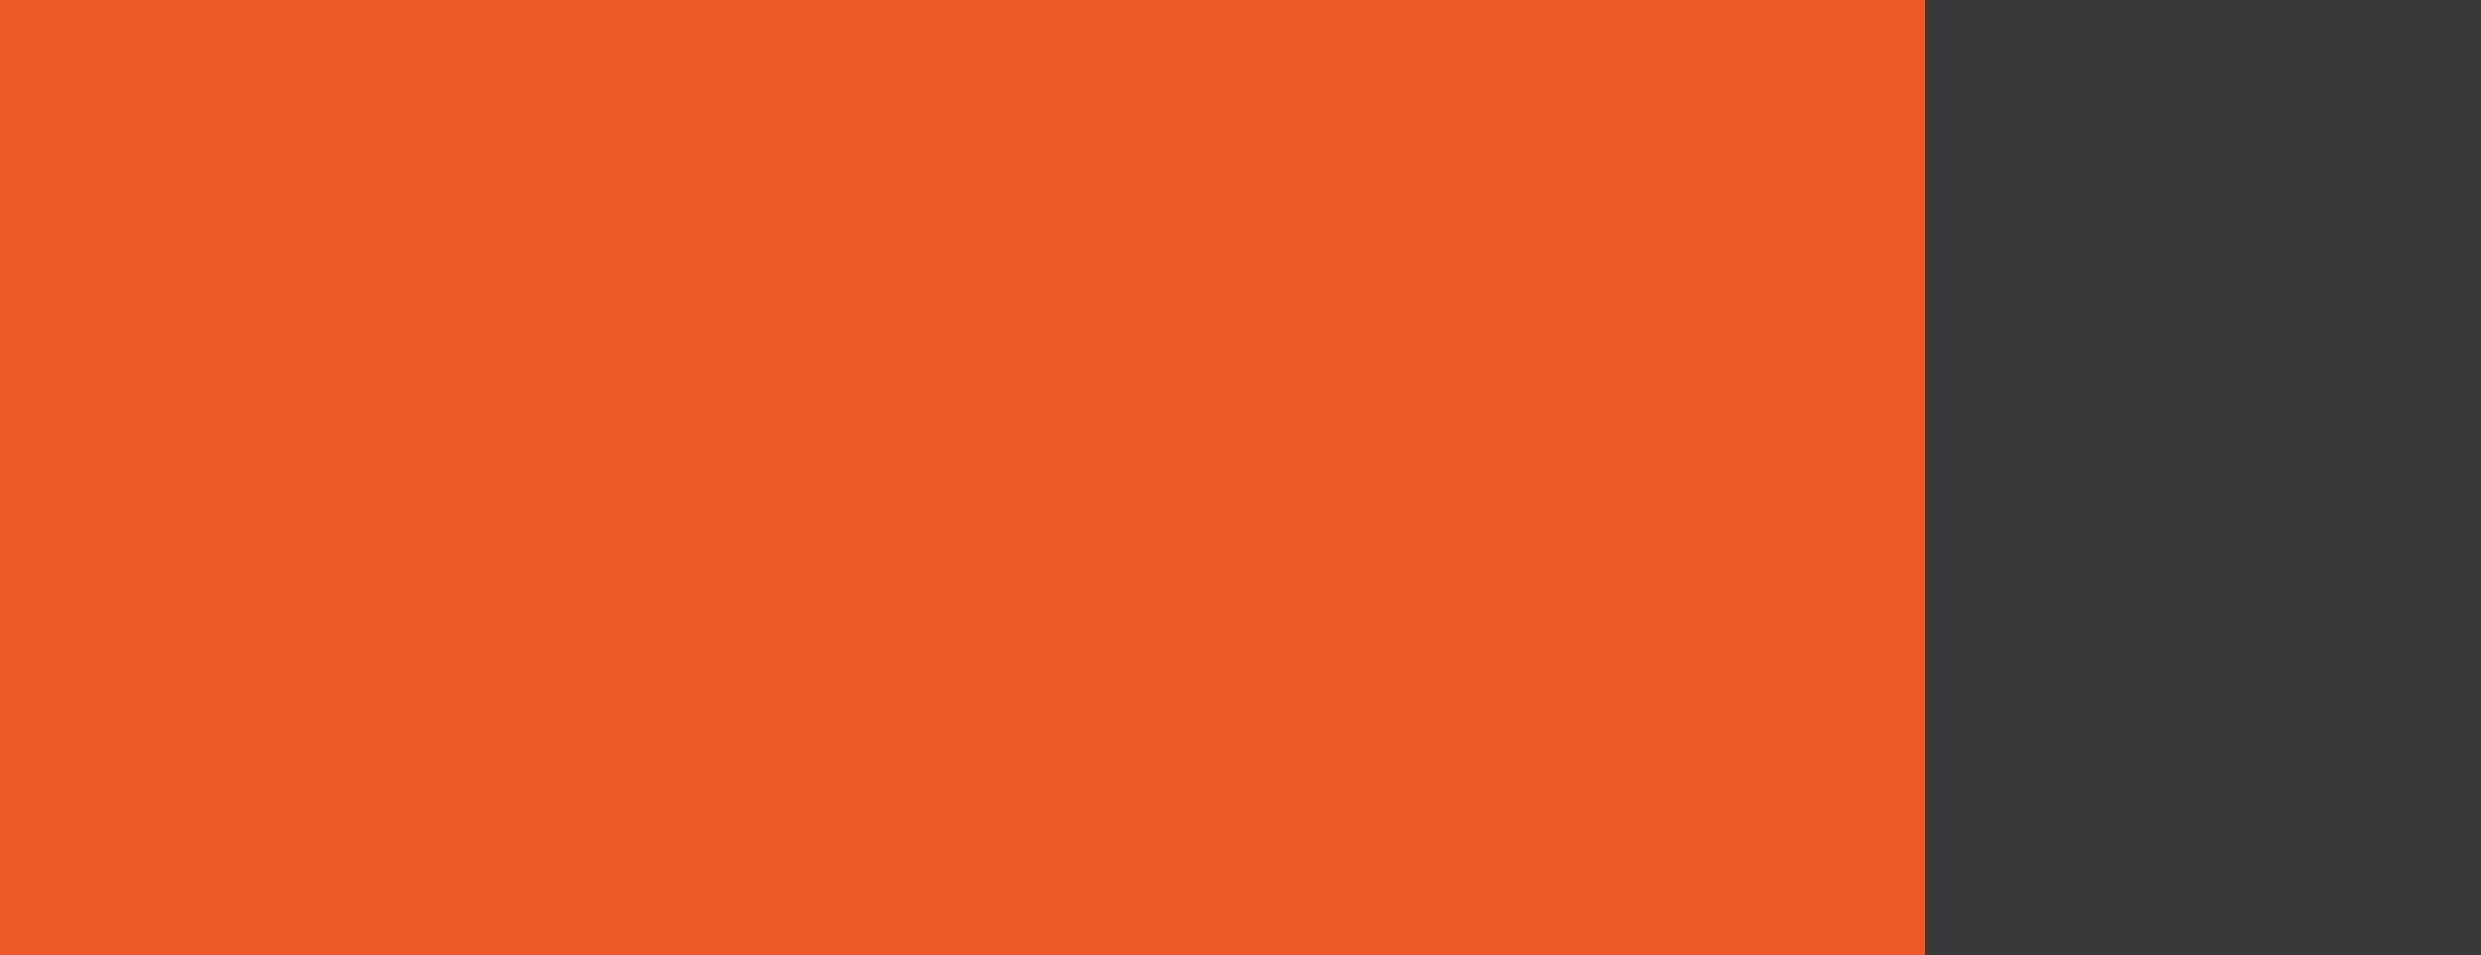 portocaliu_gri.inchis